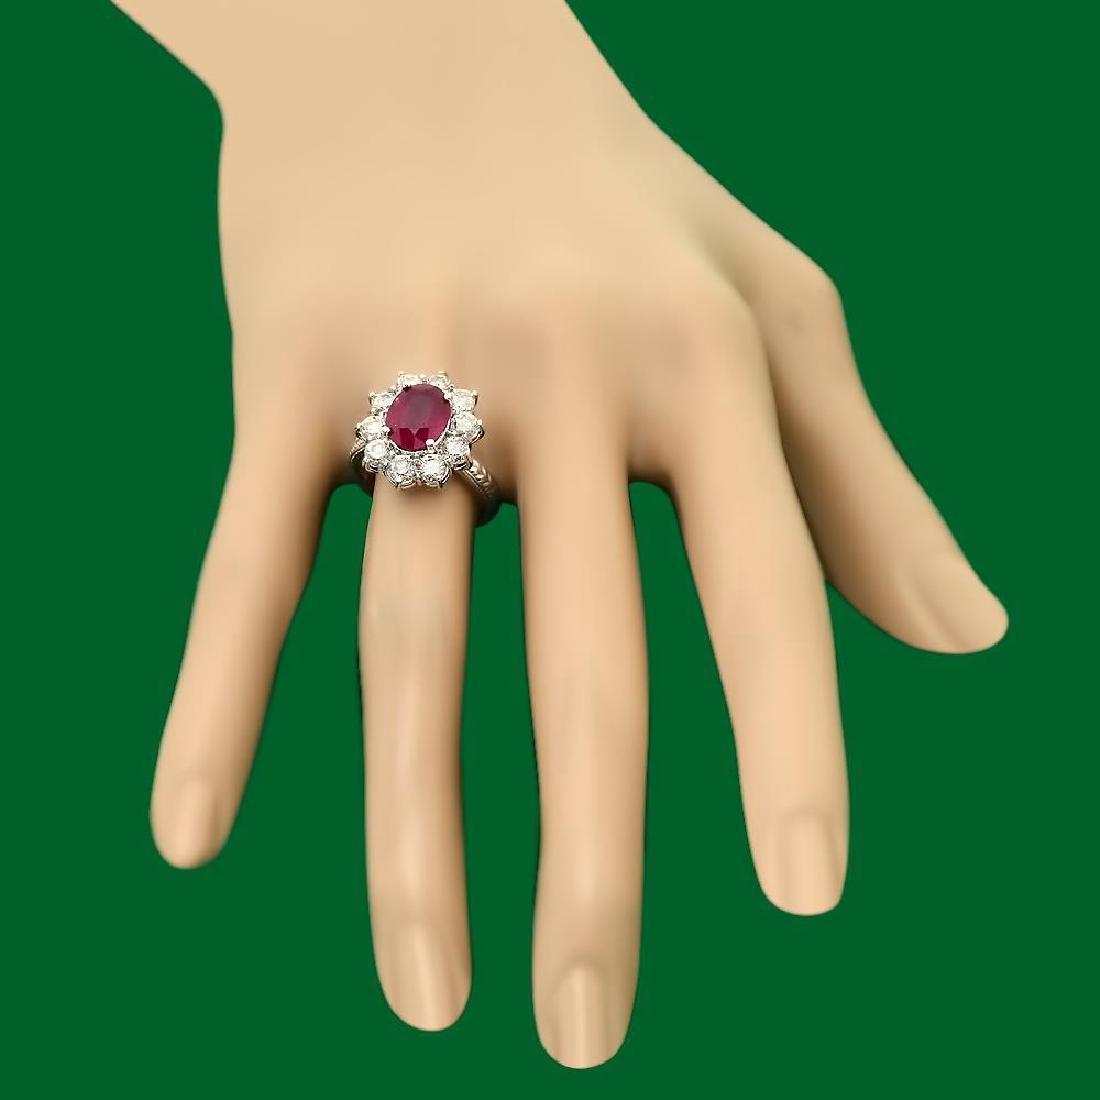 14k Gold 3.21ct Ruby 2.02ct Diamond Ring - 3